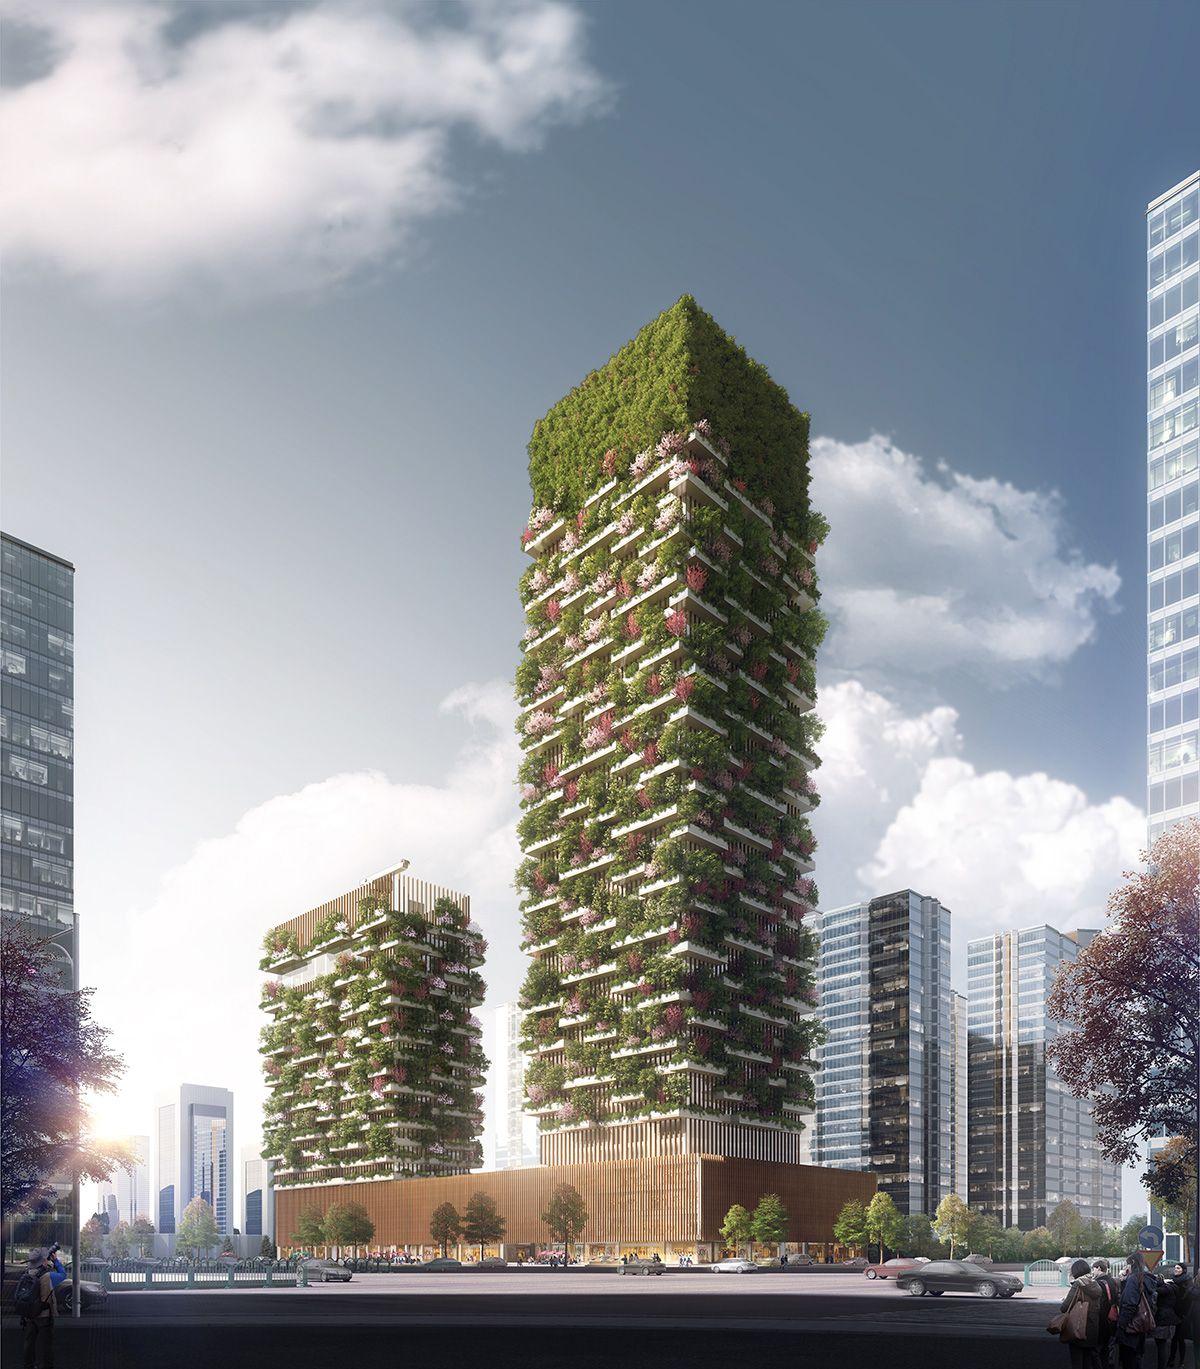 China tendrá dos bosques verticales de Stefano Boeri